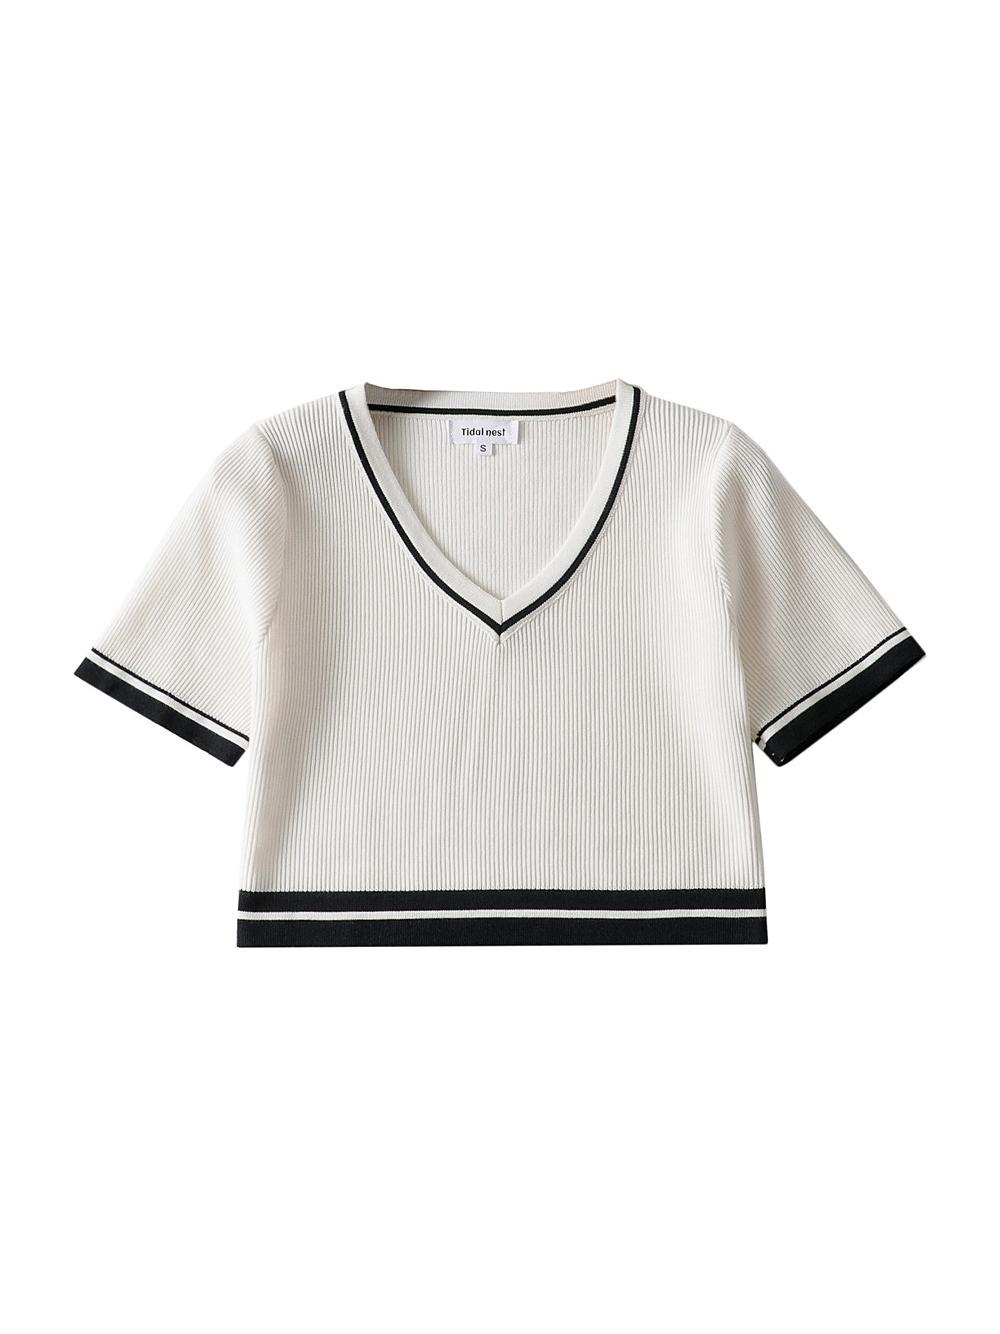 Contrast Color V Neck Knitted Short Sleeve Blouse